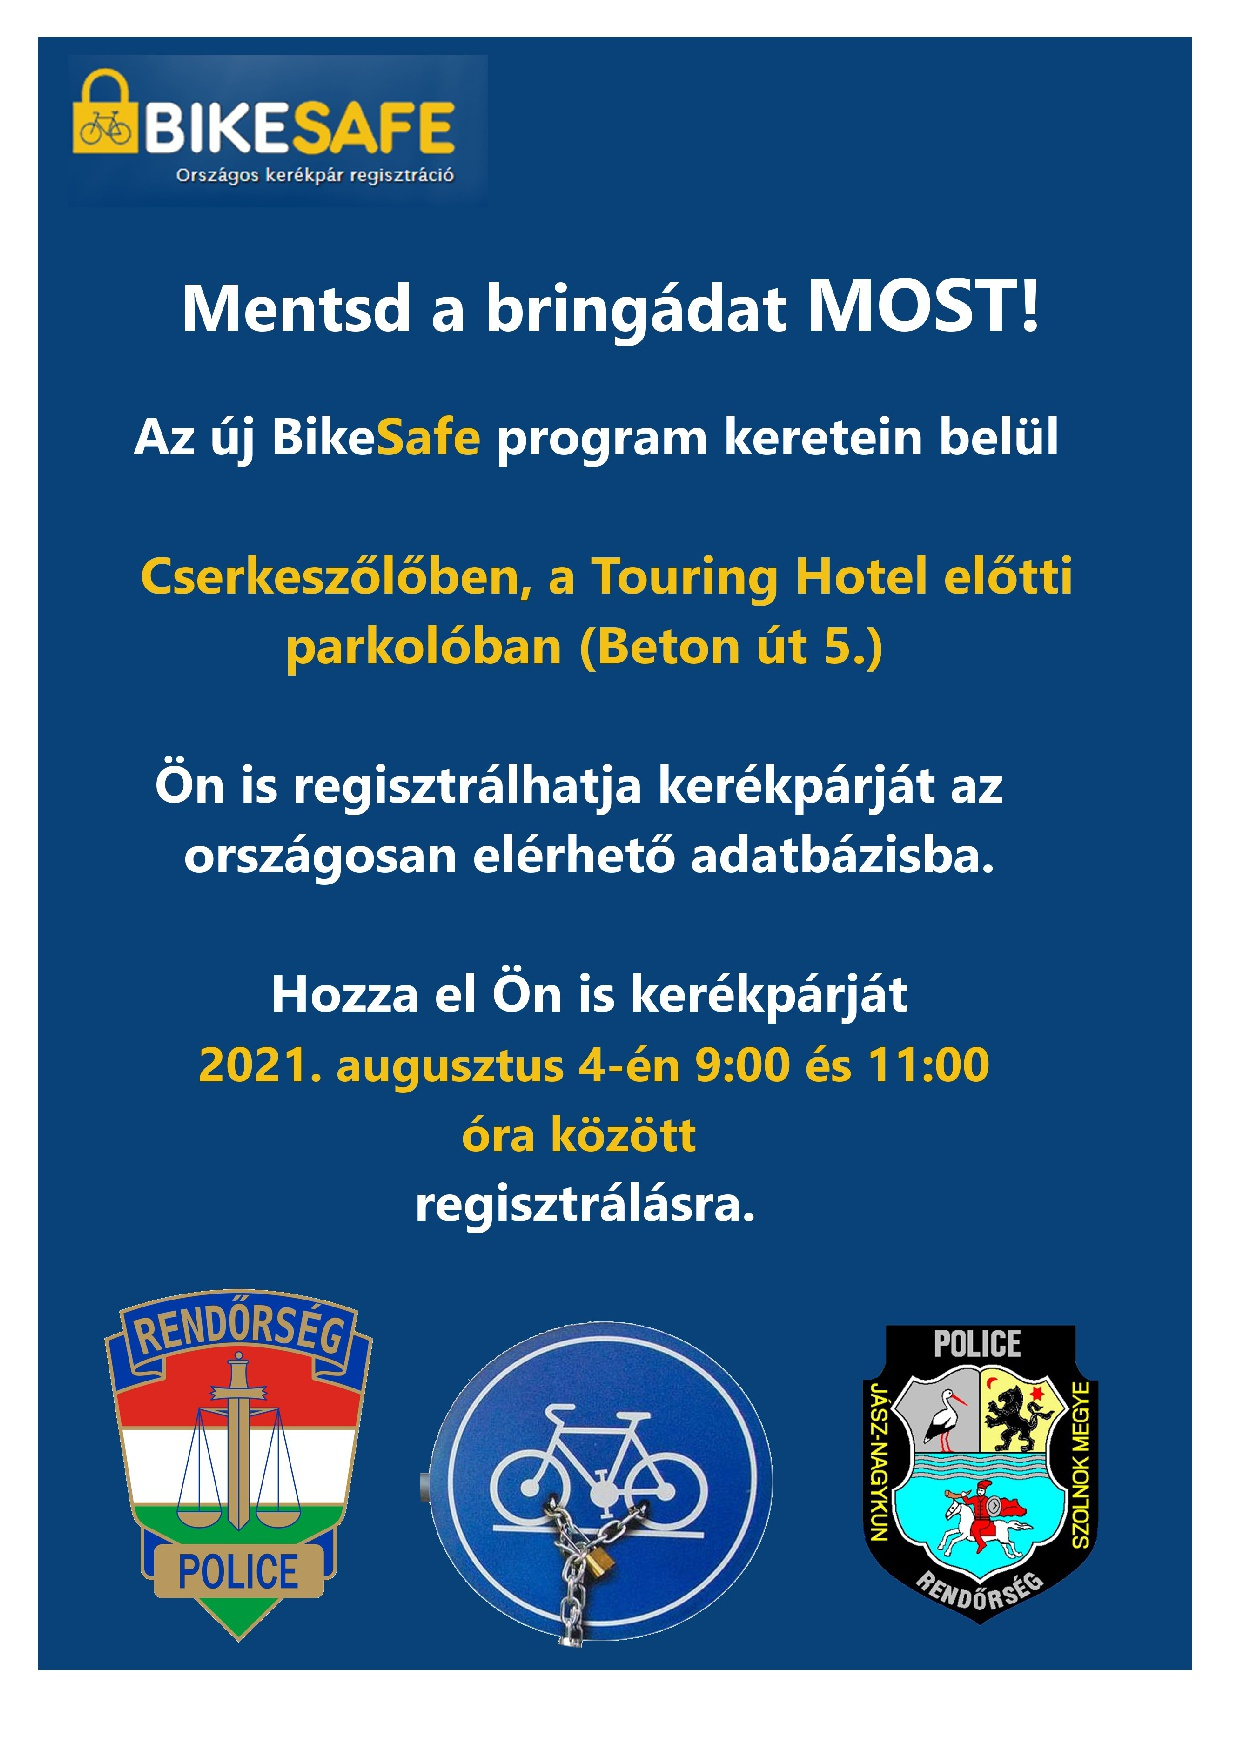 BikeSafe (aug.4. 9:00-11:00)